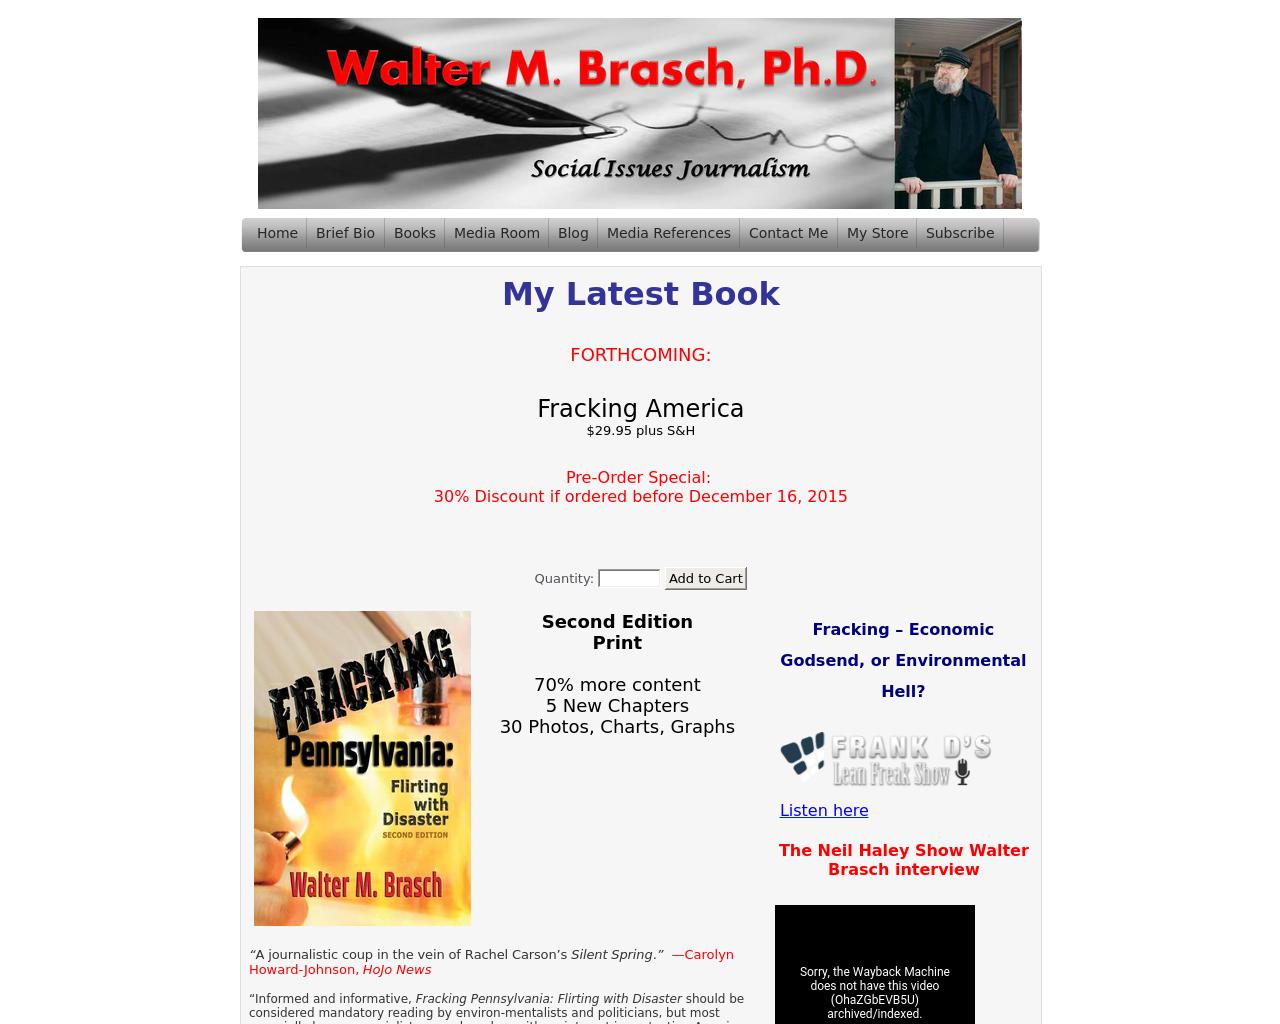 Walter-M.-Brasch-Advertising-Reviews-Pricing